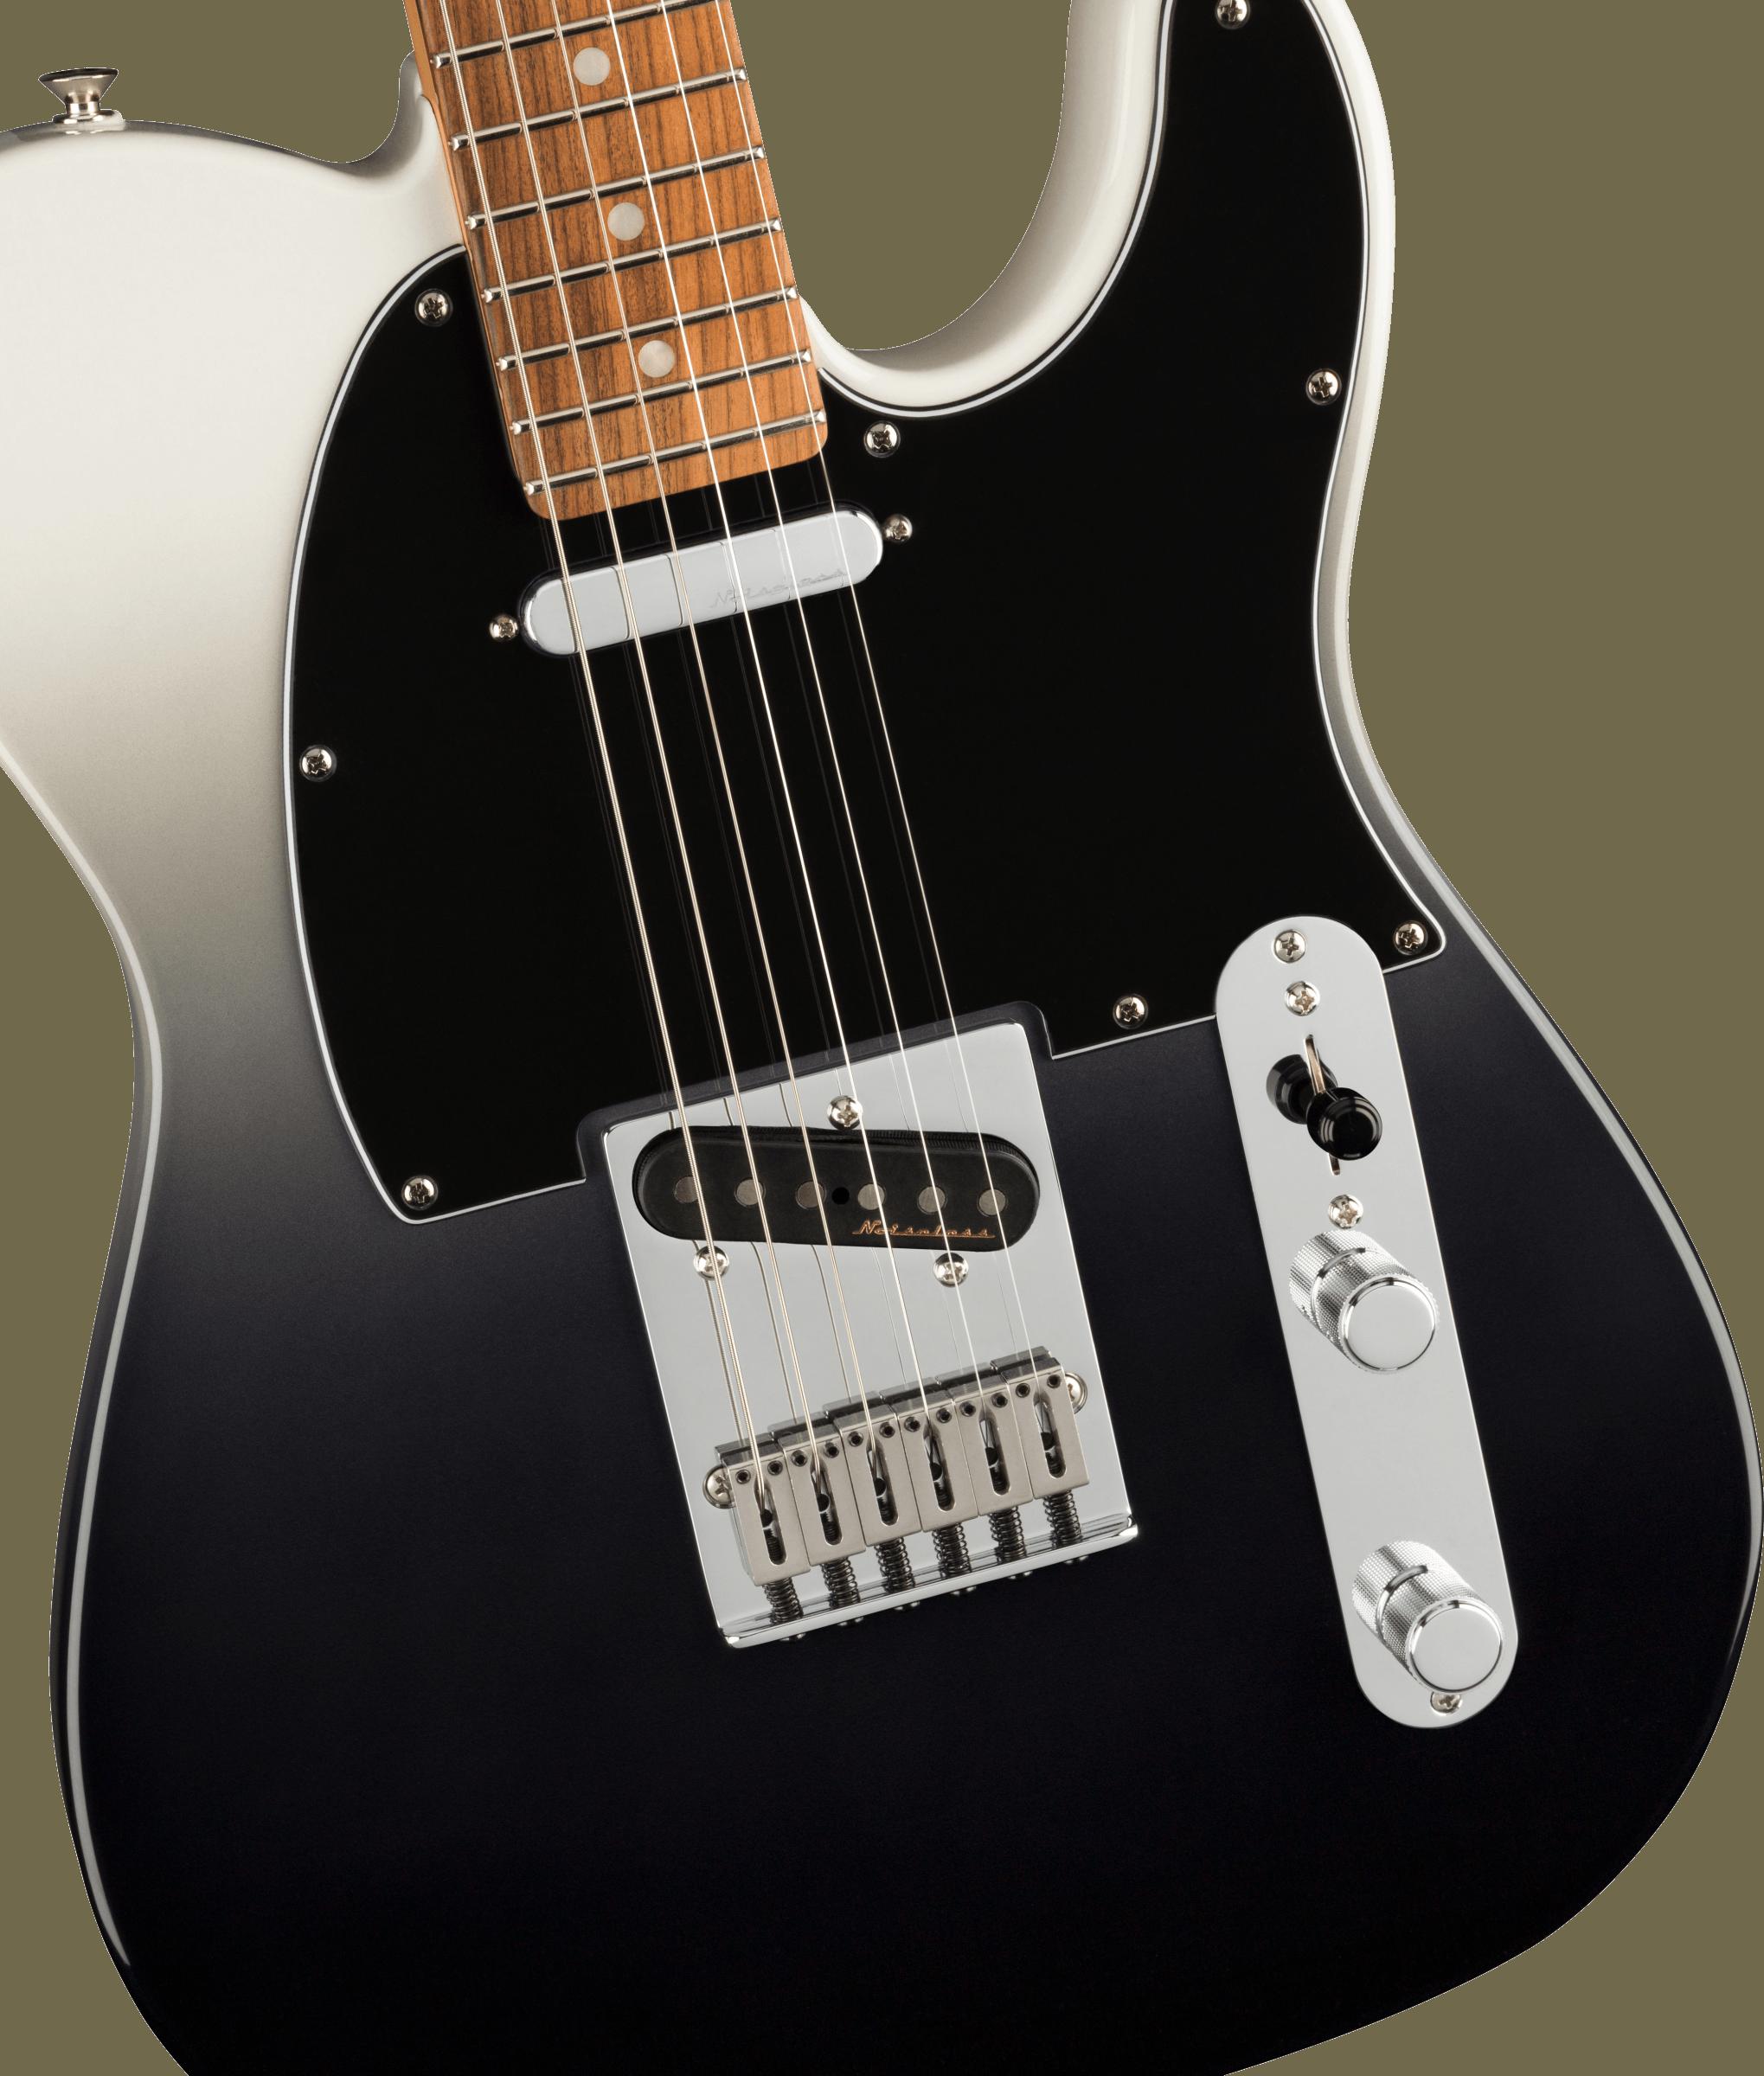 Fender Player Plus Telecaster - Silver Smoke